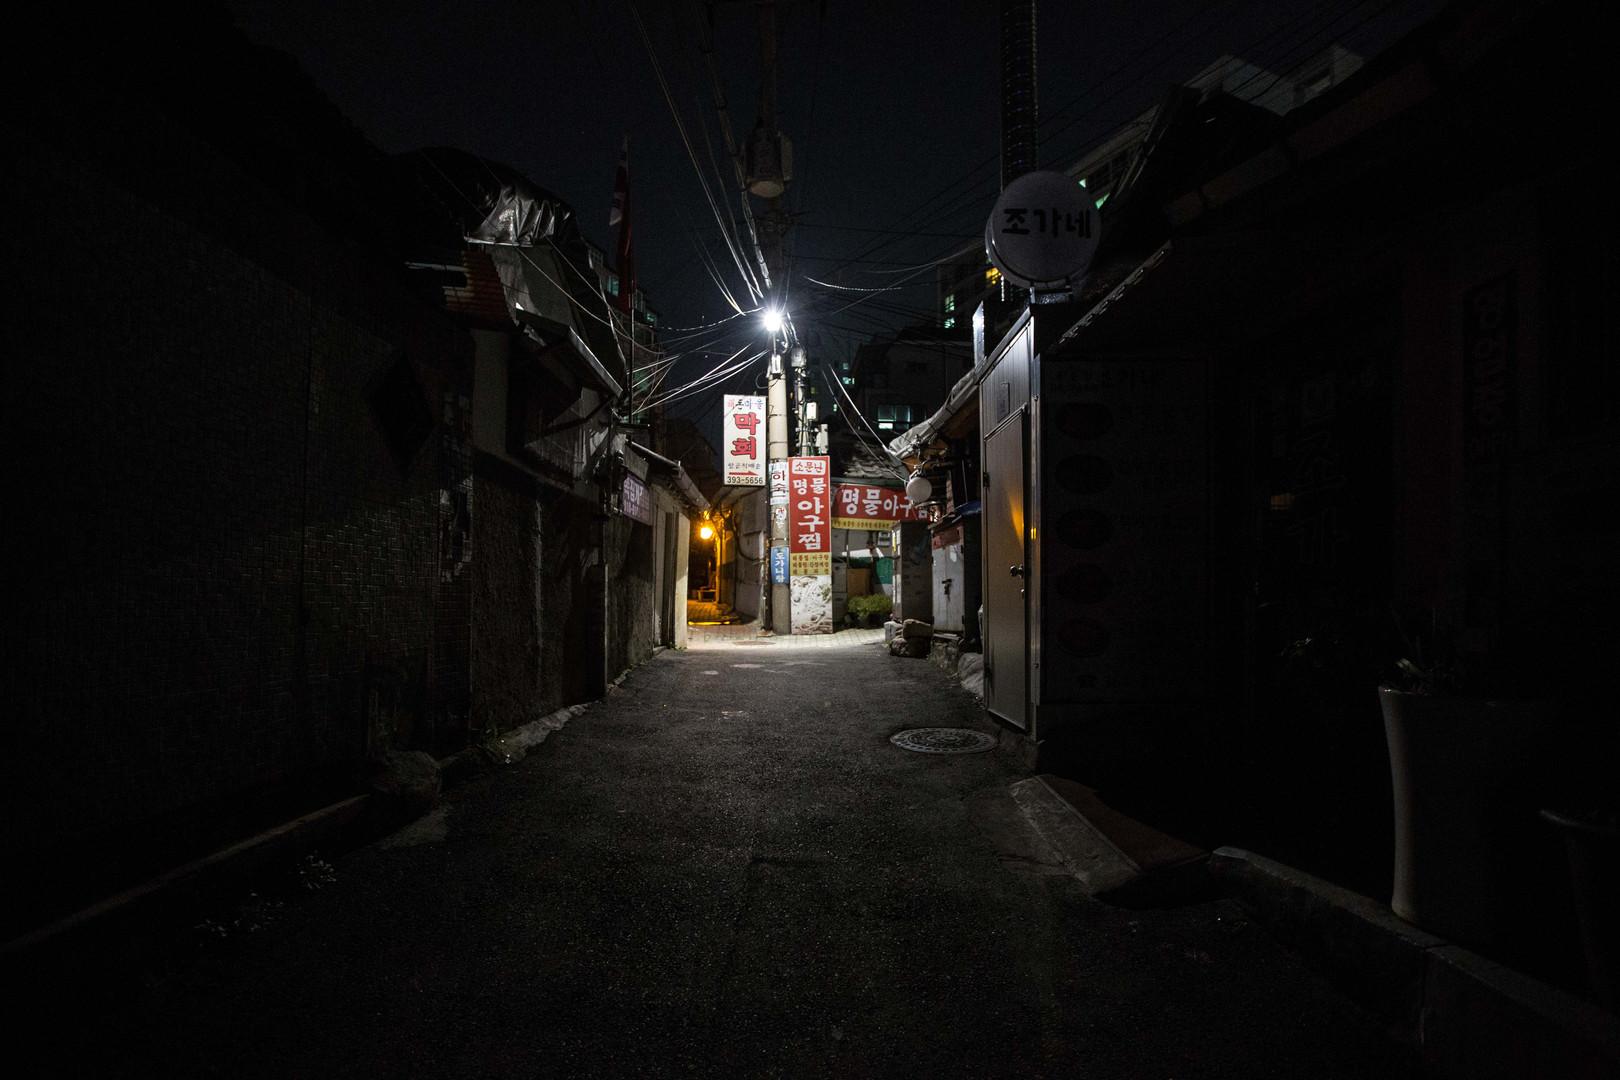 seoul street night #13